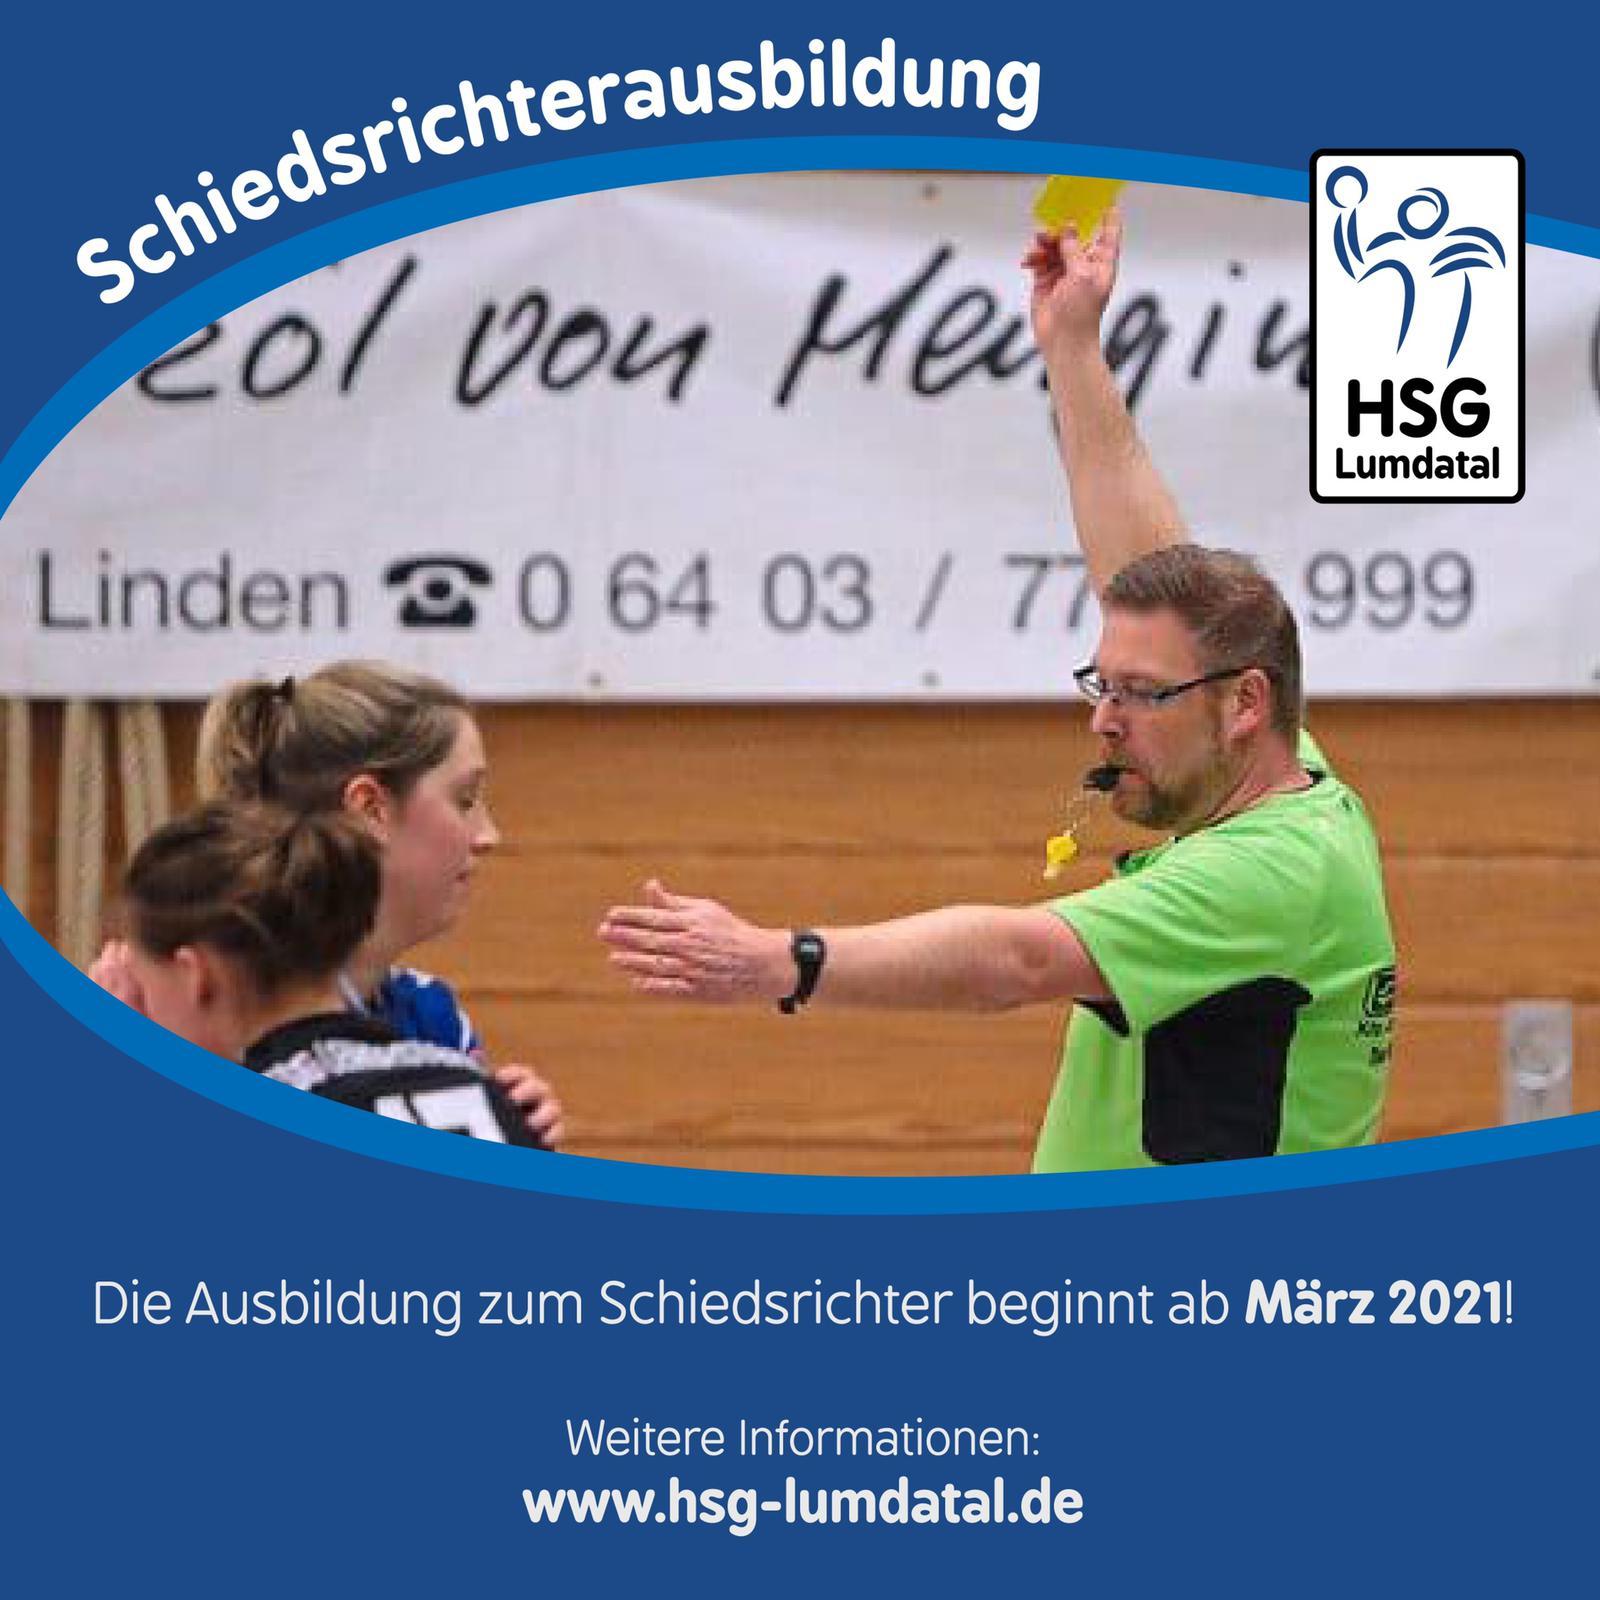 Schiedsrichterausbildung 2021